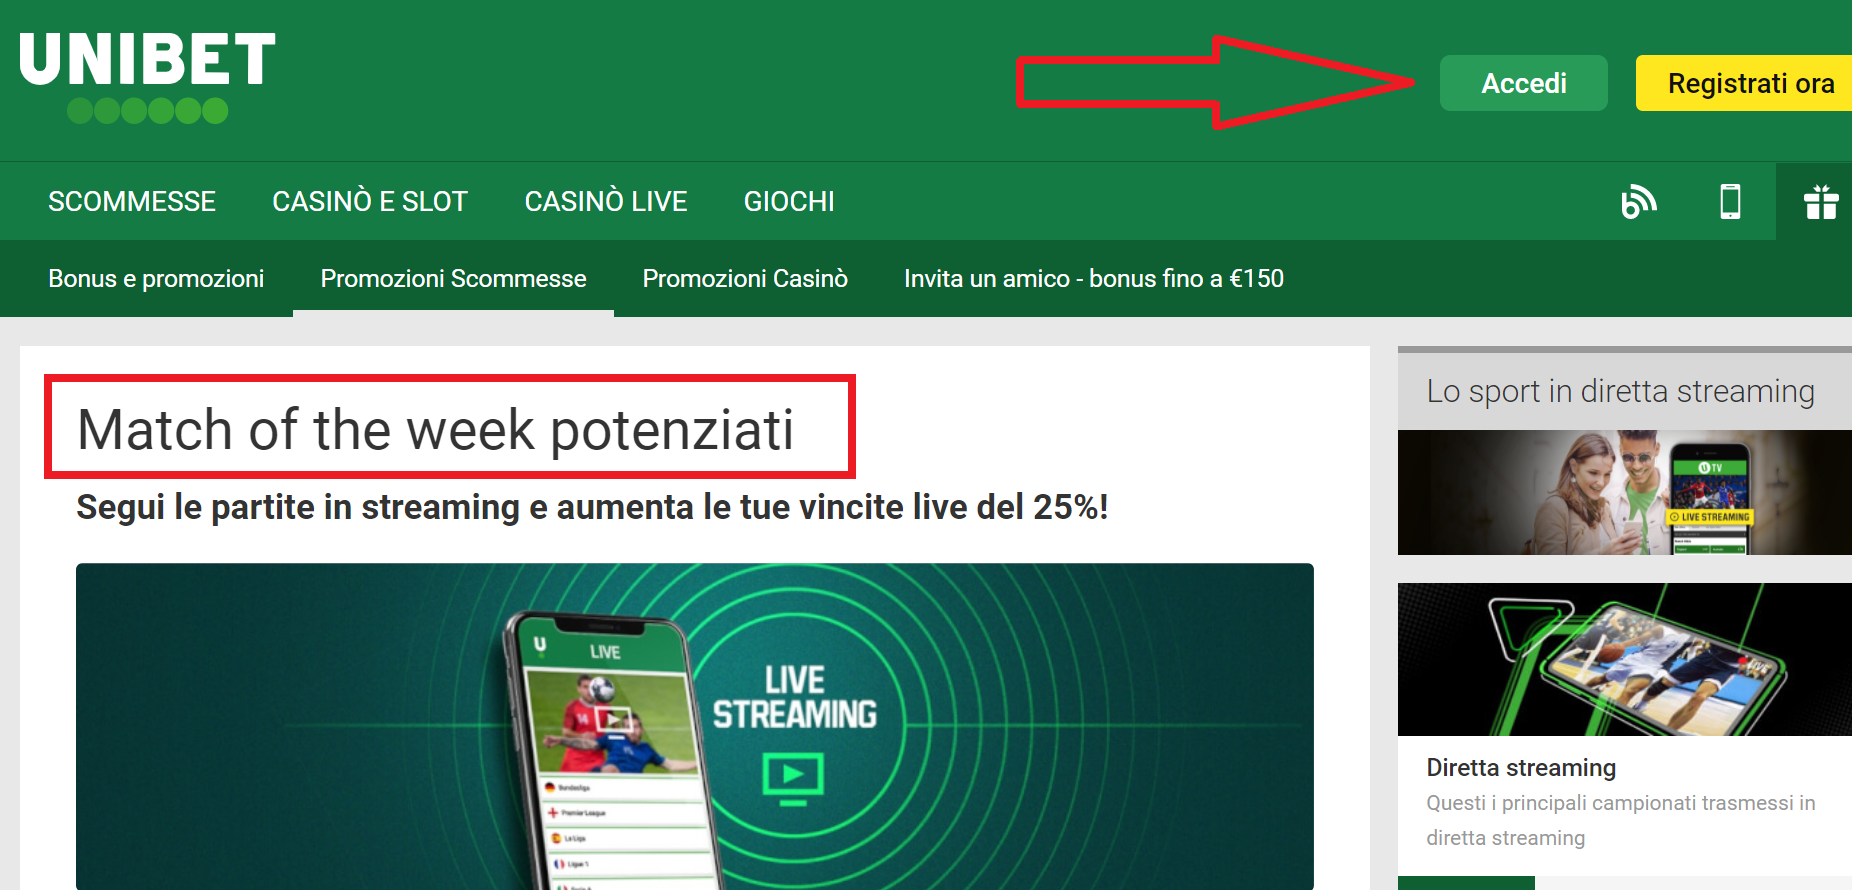 Mettere giù le scommesse su Unibet sportive sul web?